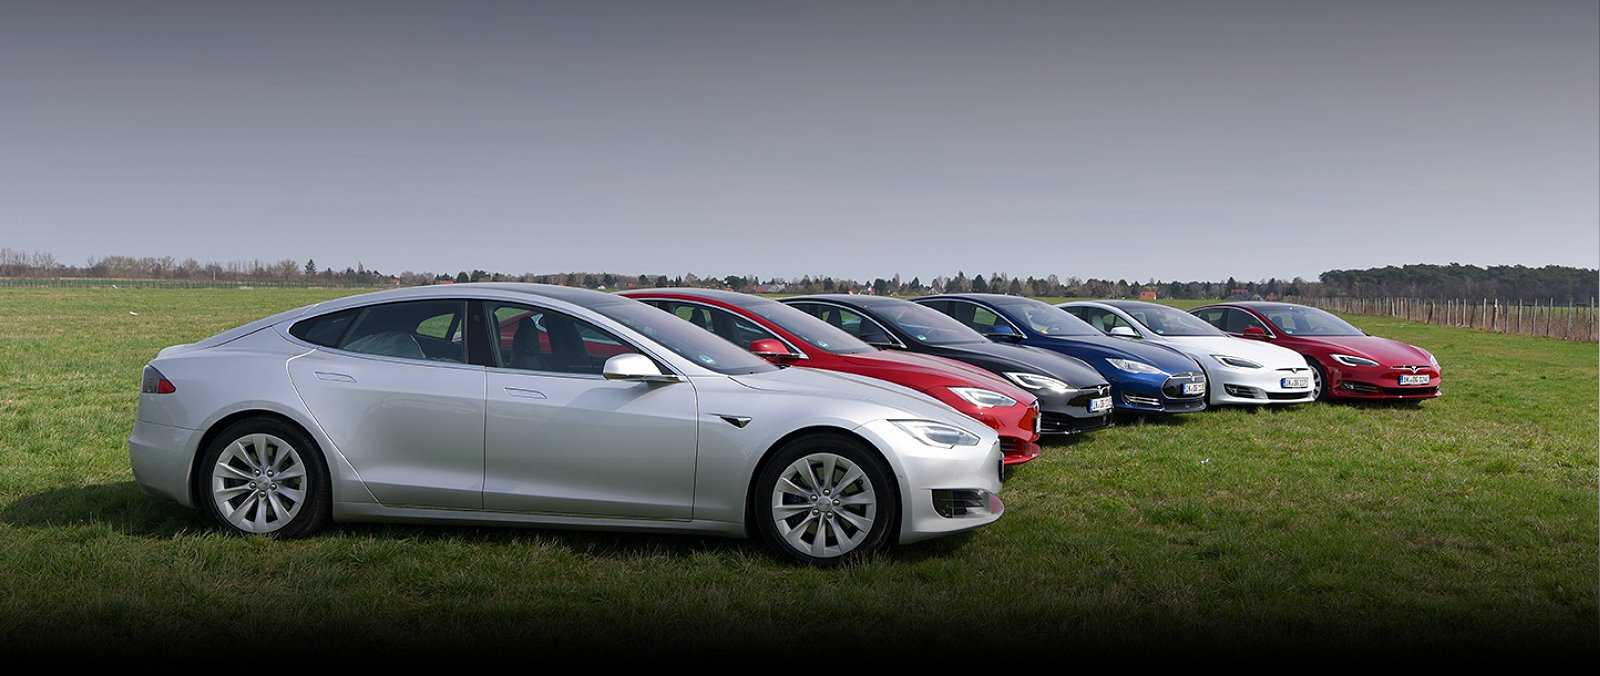 7 TESLA Model S im cyx Fuhrpark